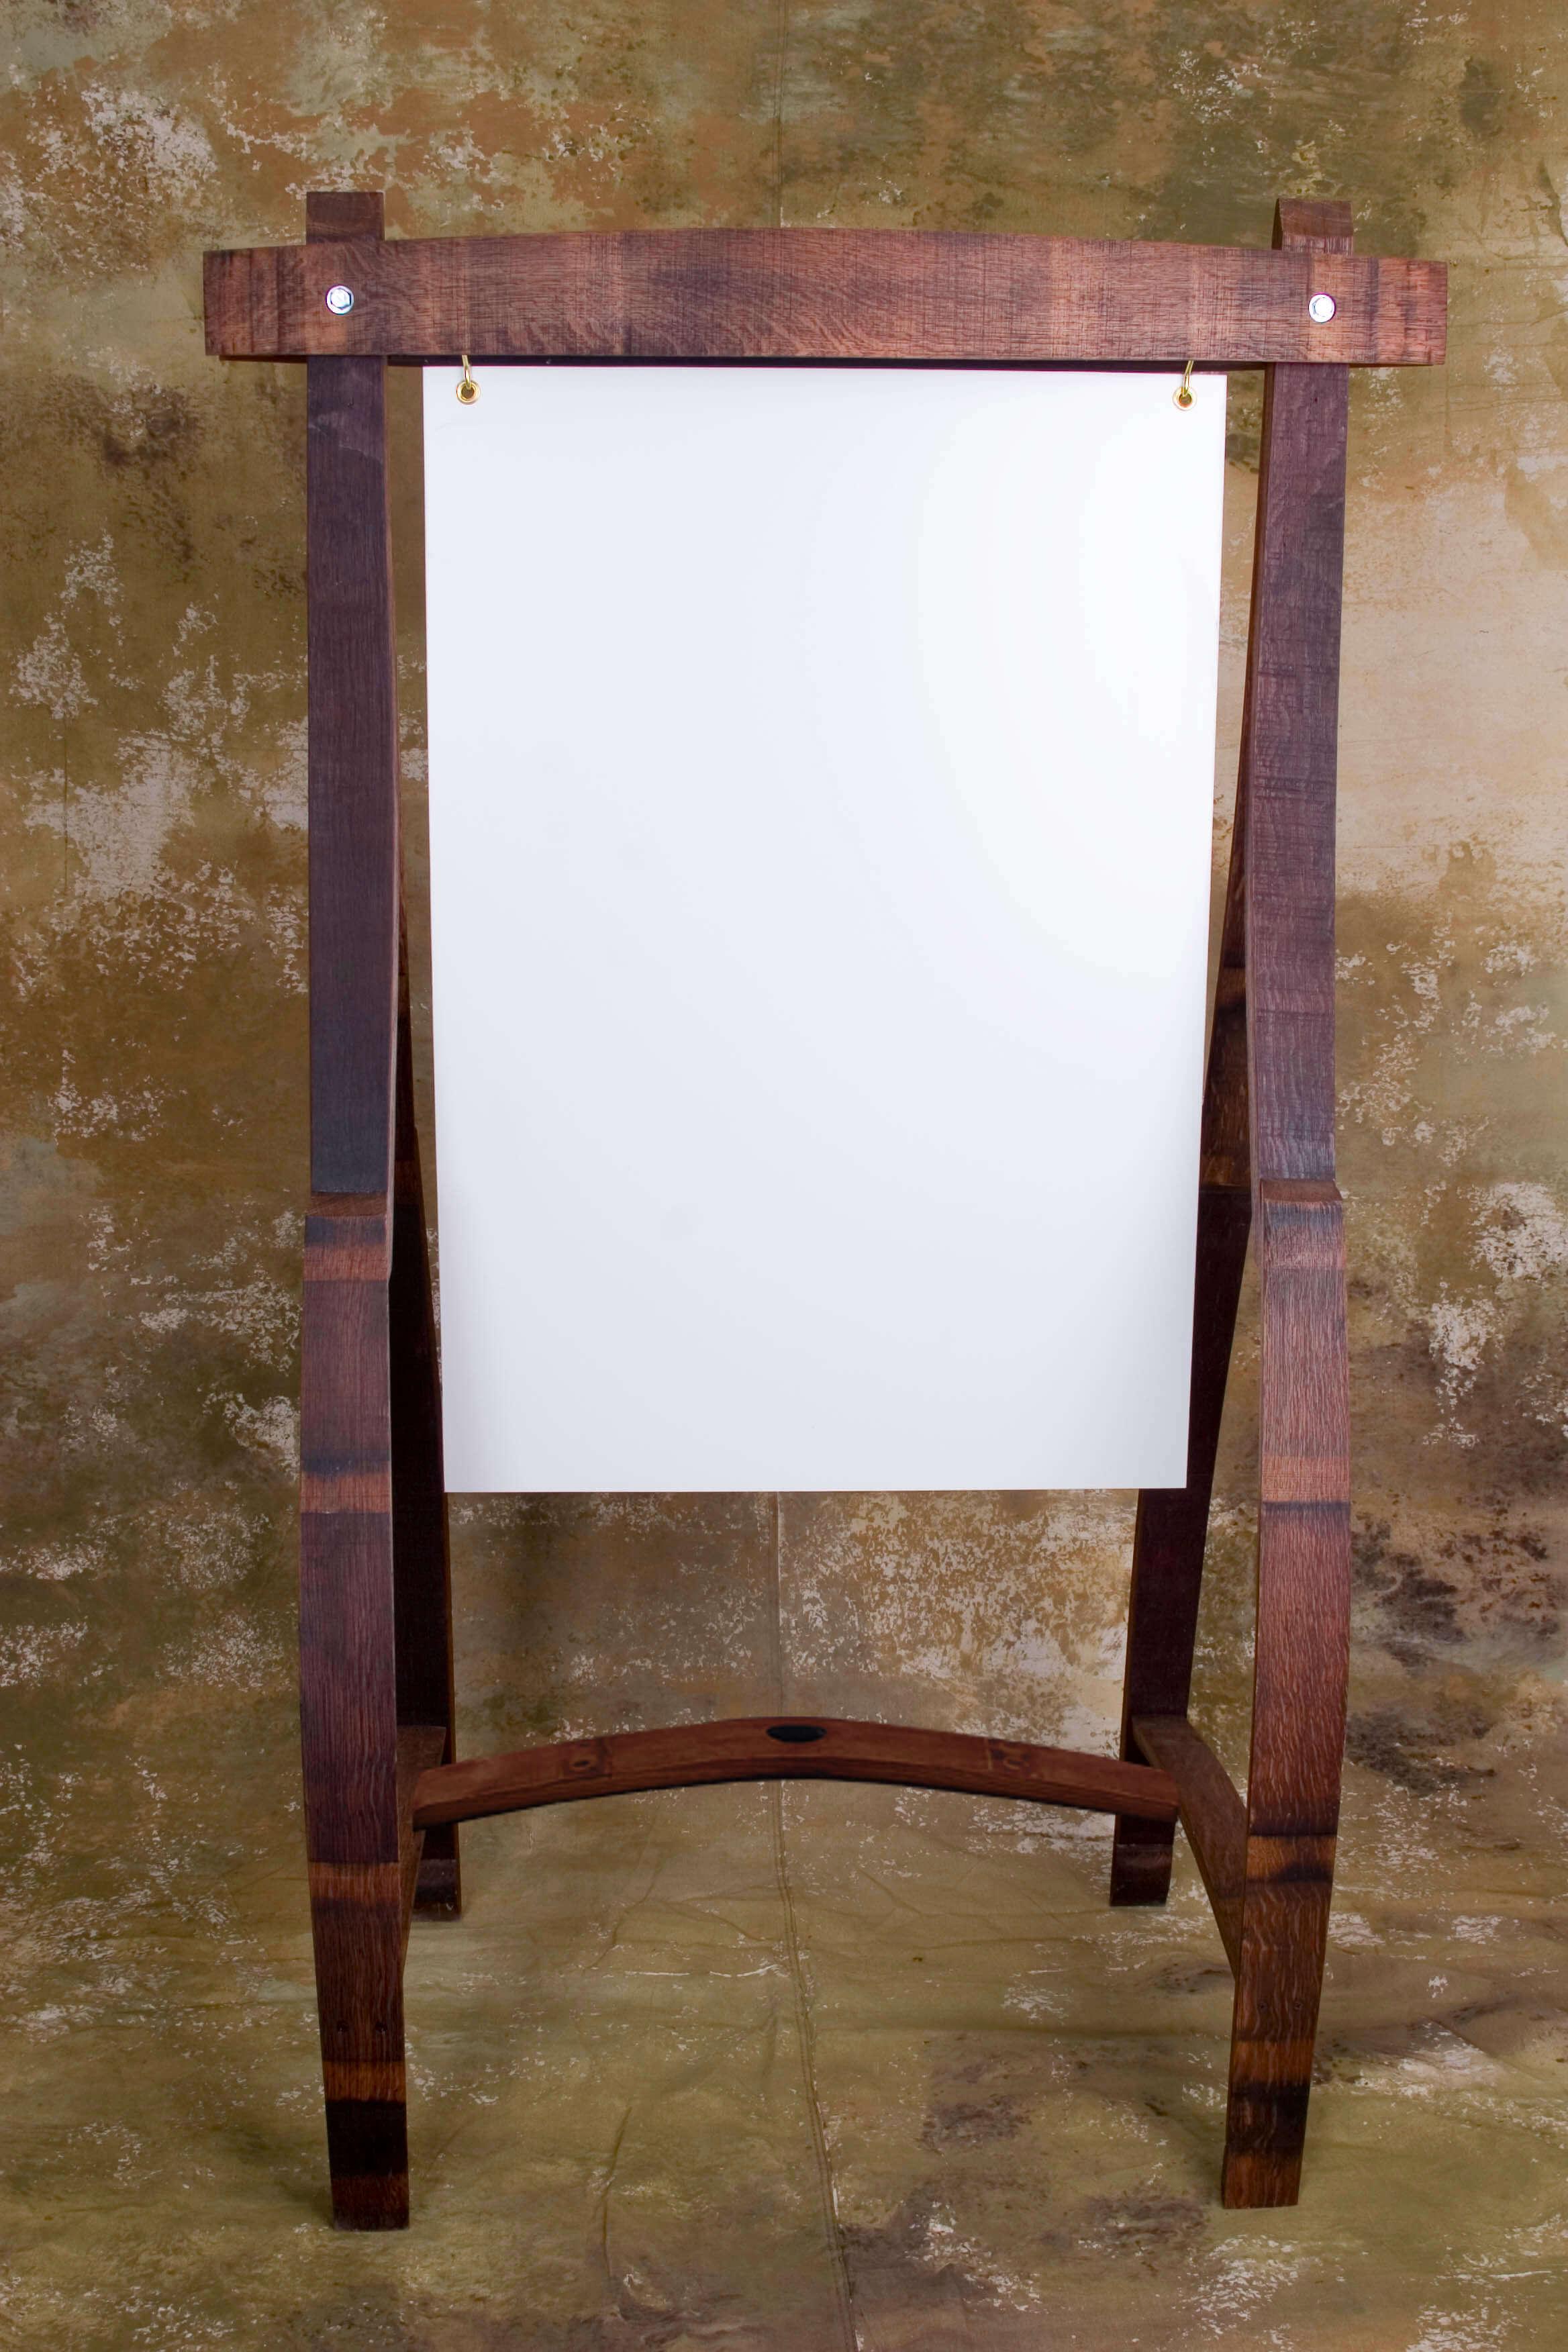 Wine Barrel Chalkboard 5 A Frame Easel Floor Sign Ewoodart Standing